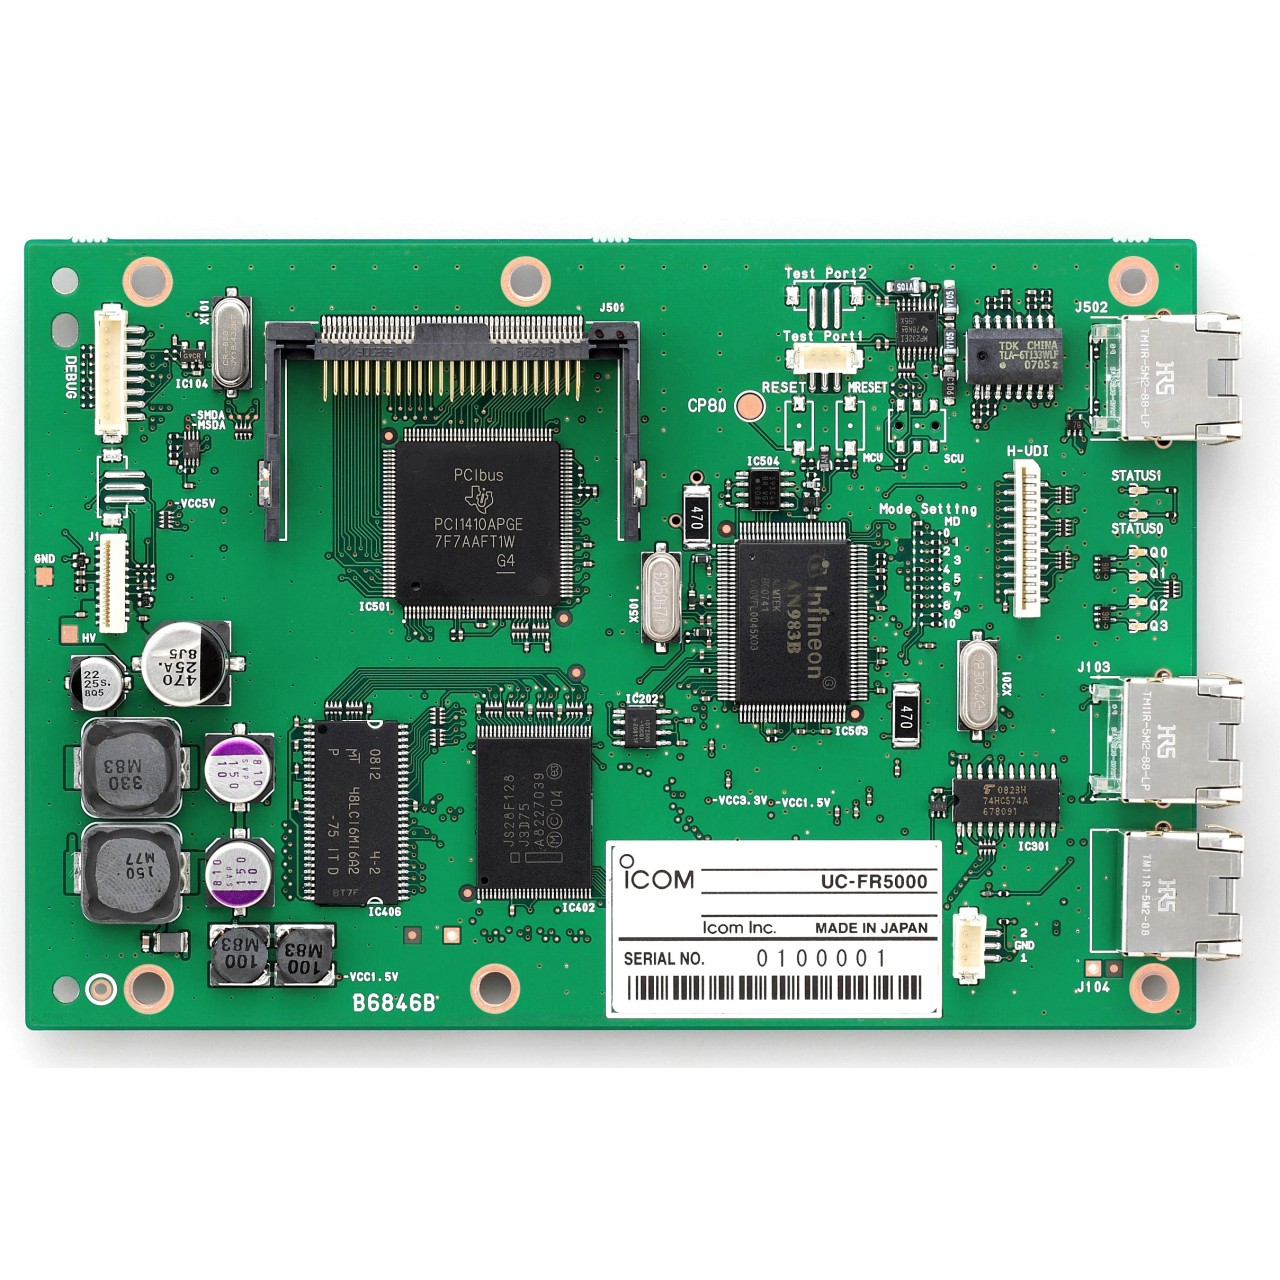 UC-FR5000 Interfaces - ICOM